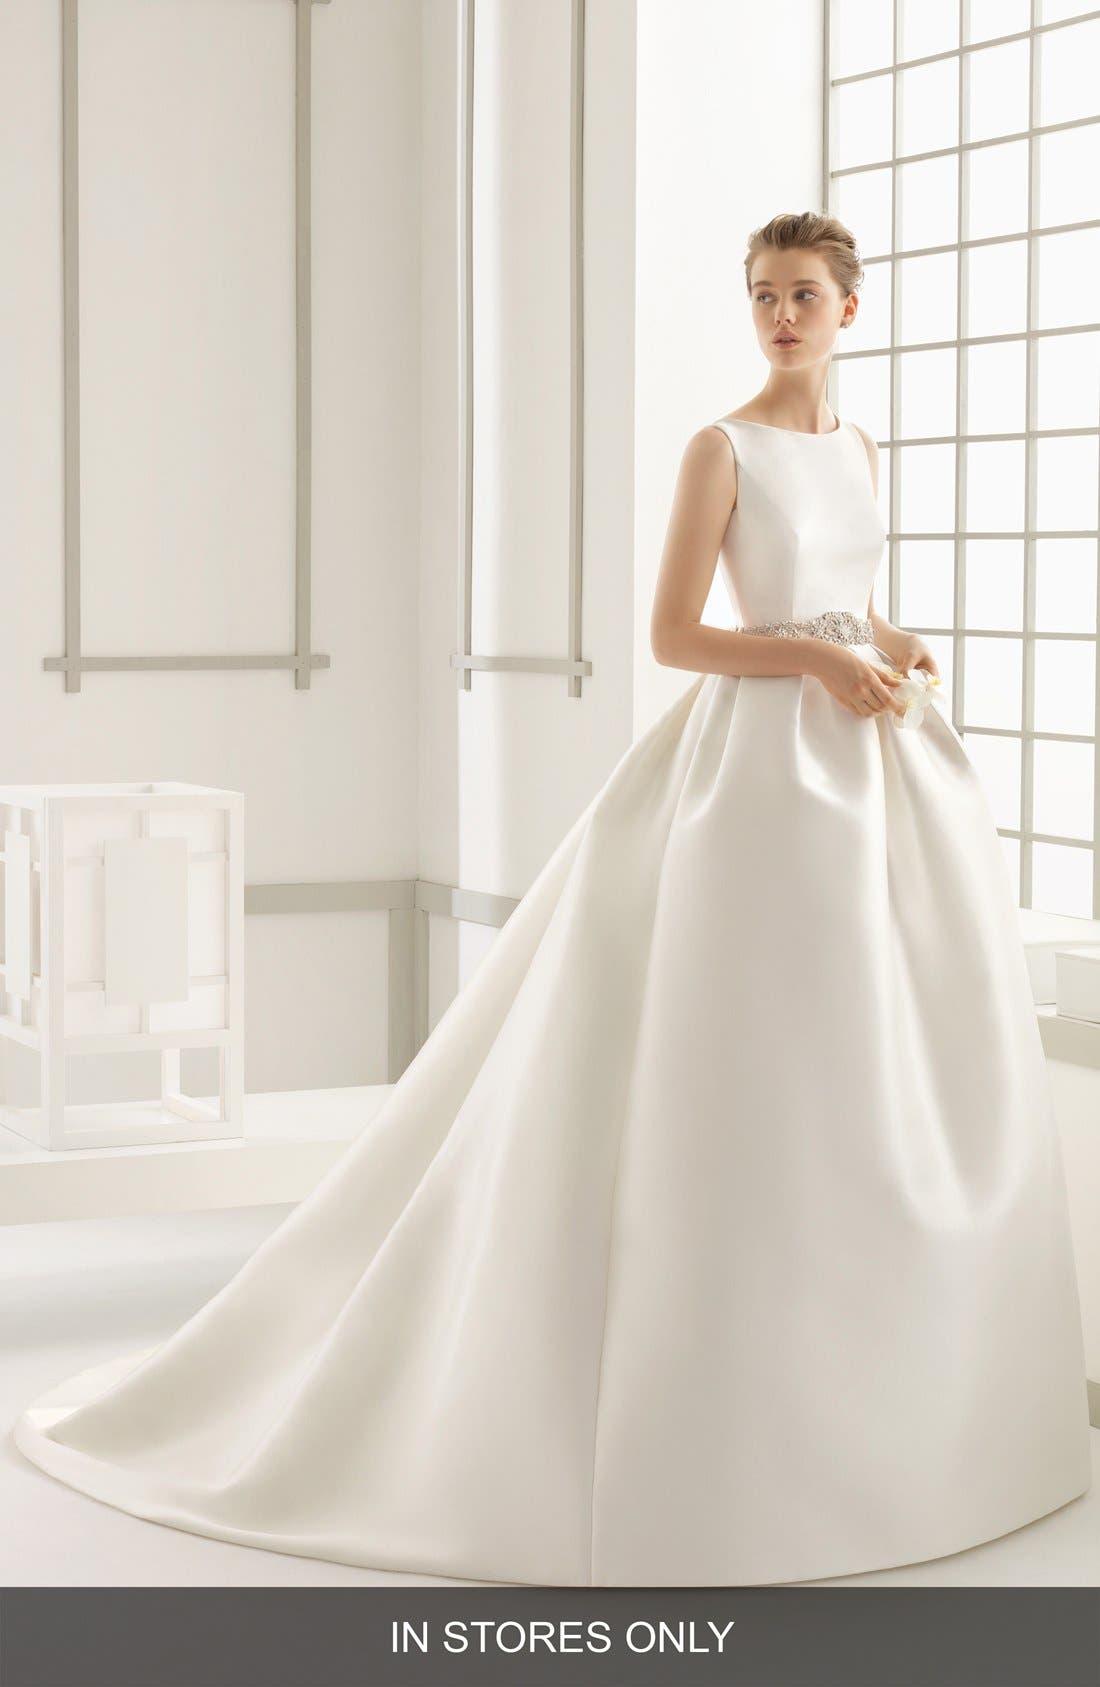 ROSA CLARA 'Delfos' Beaded Back Ballgown Dress